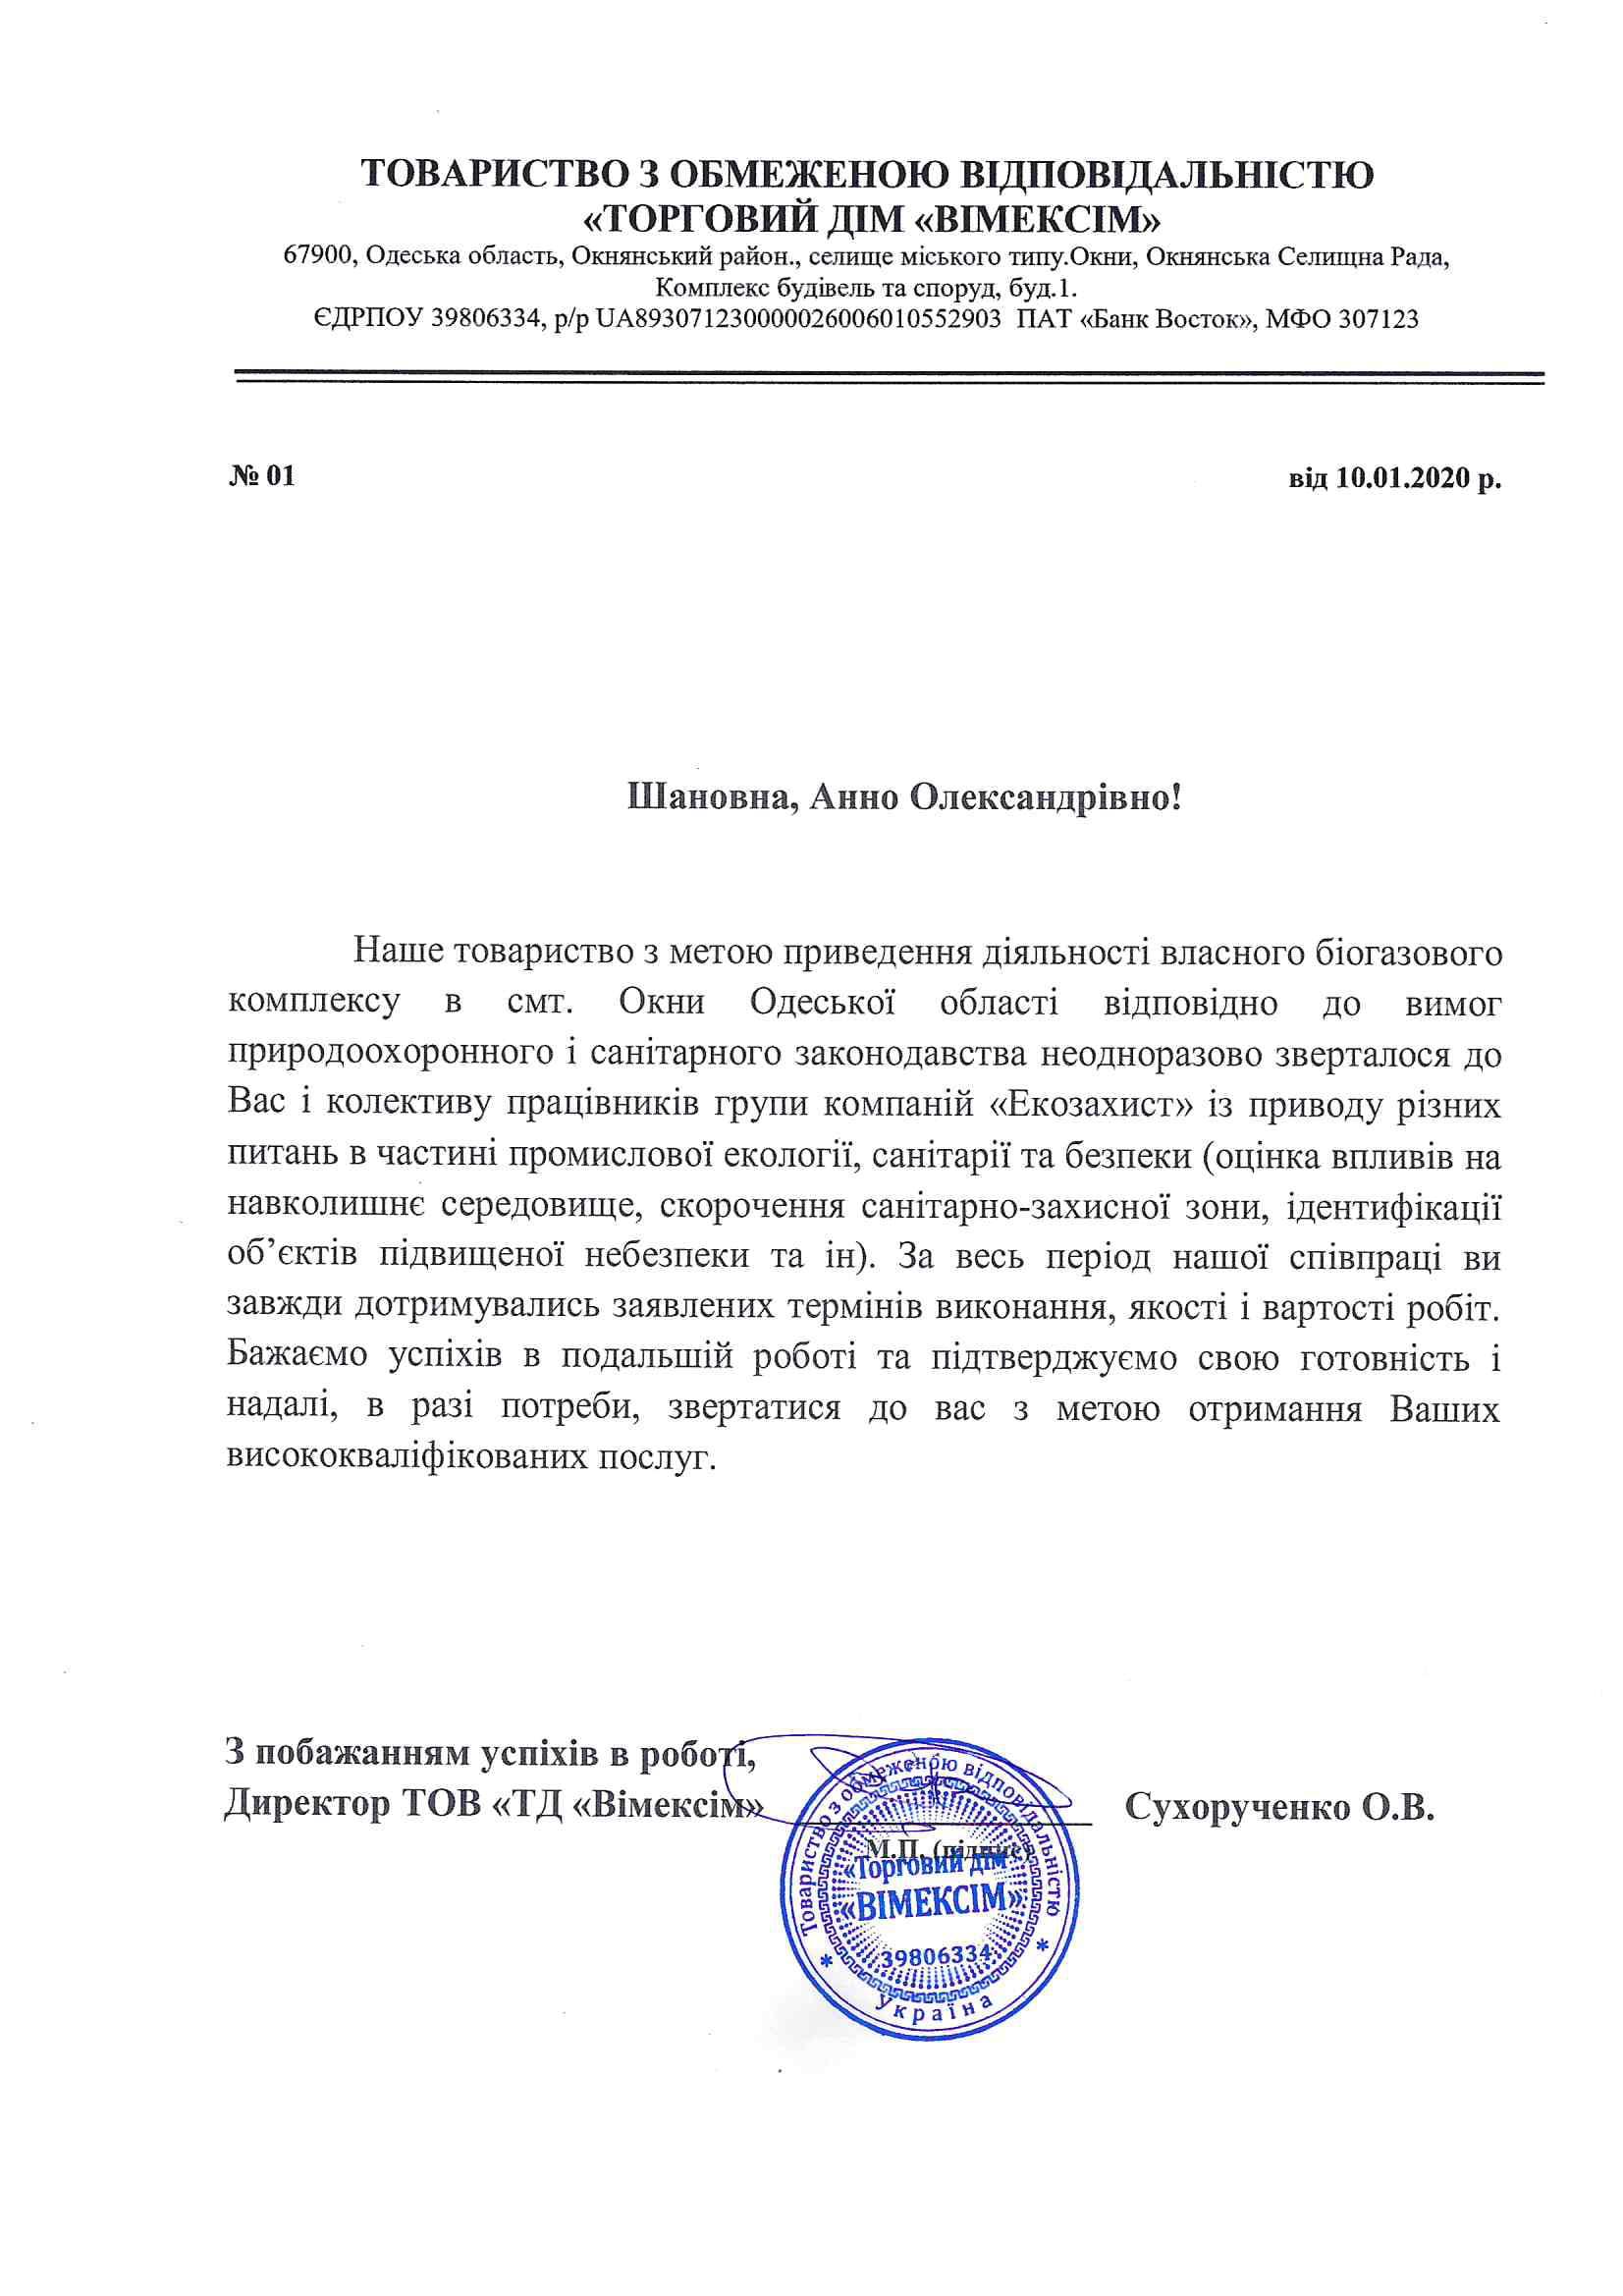 "Директор ООО ""ТД ""Вимексим"" – СухорученкоТ.Д."